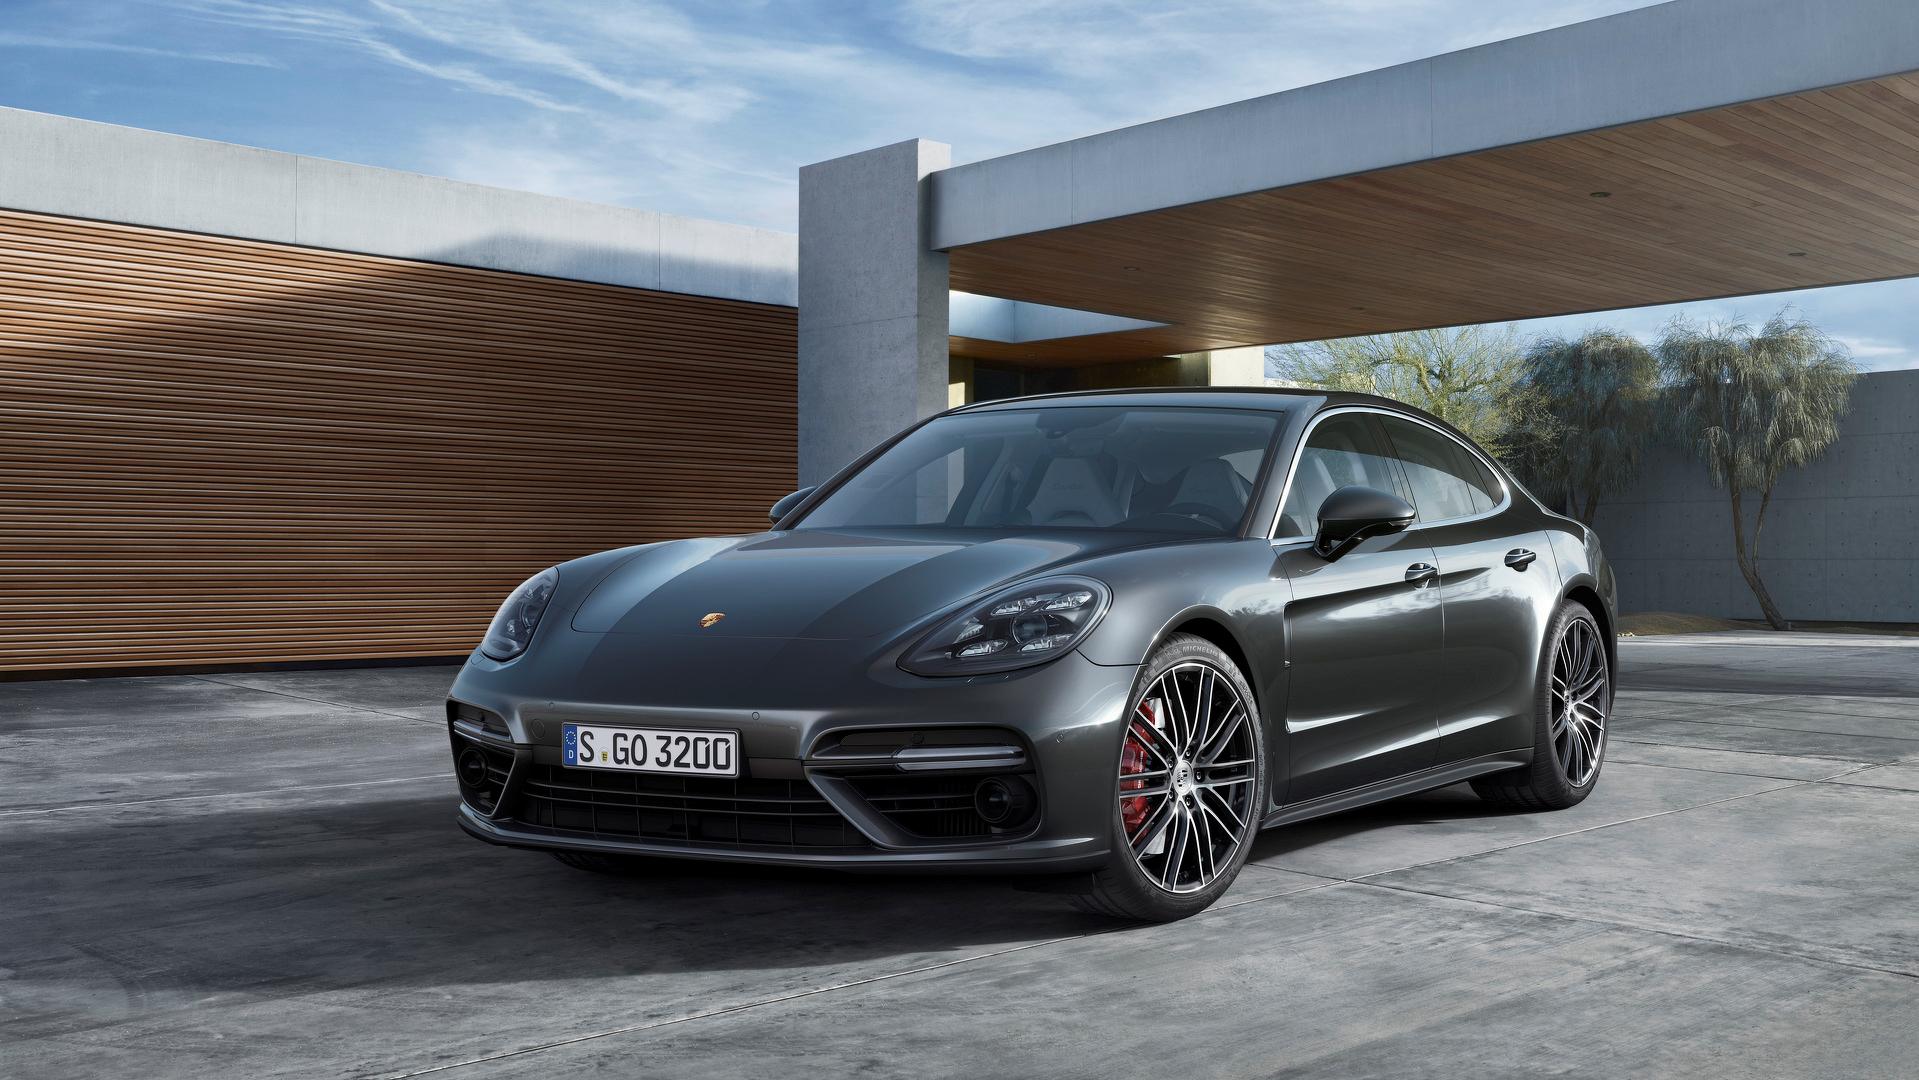 Kelebihan Kekurangan Audi Porsche Spesifikasi